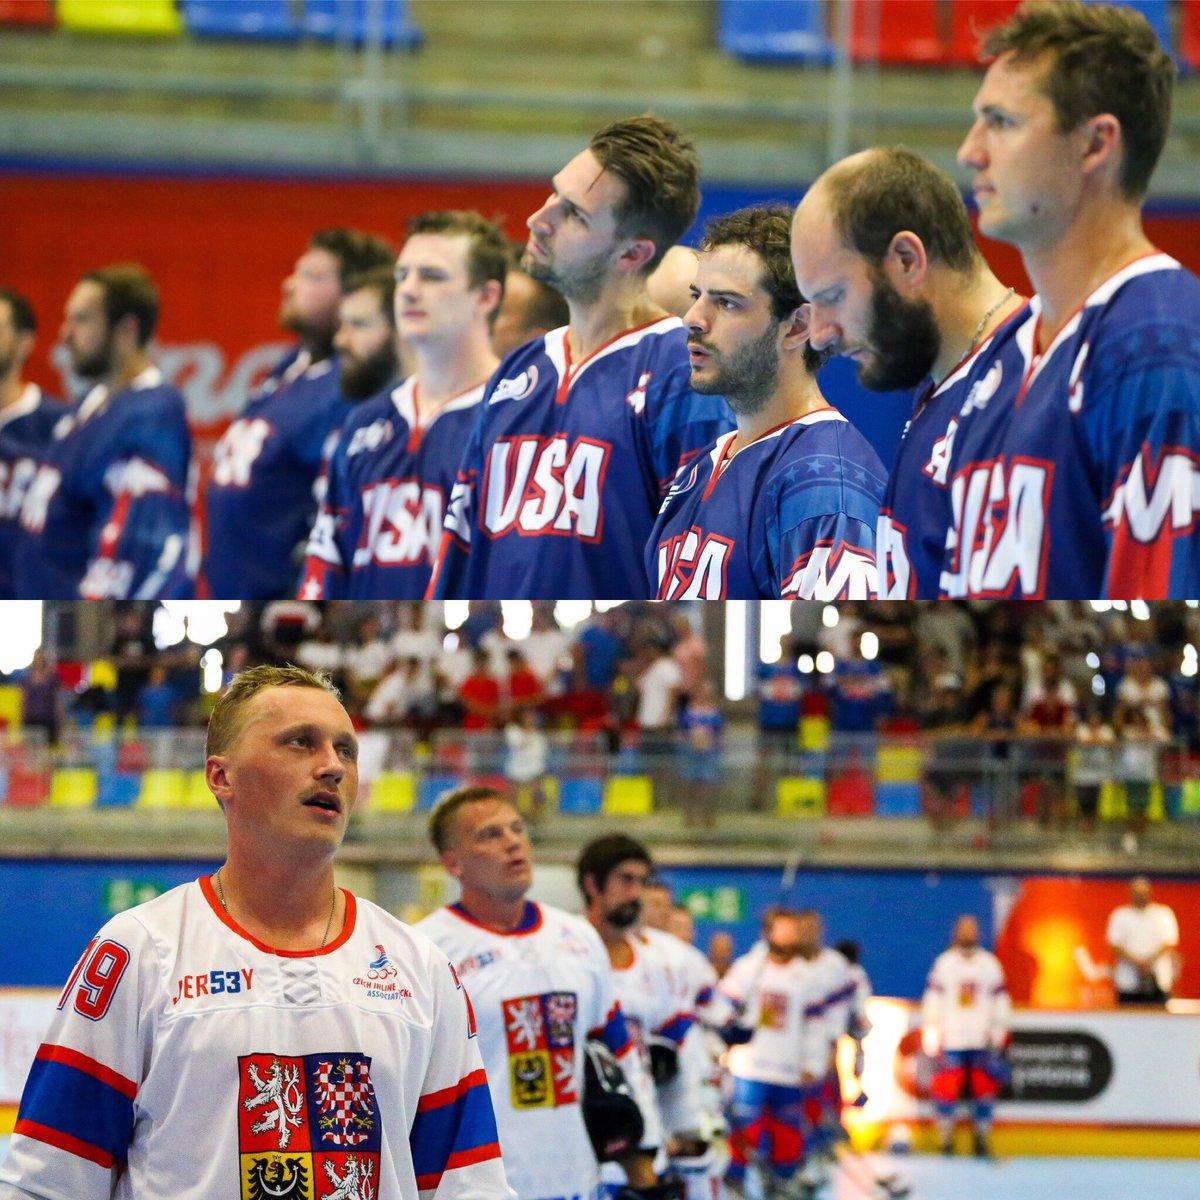 🥅🏒#inlinehockey🏒🥅#WORLDROLLERGAMES   Senior Men championship FINAL is CZECH REPUBLIC vs USA. Loskot, Cik and Rubes goals lead CZE to the FINAL. GOLD RUSH is definitively at last step!#Worldskate #WRG2019 #skateaddicted #everybodyloveswheels @wrgbarcelona @TheWorldGames